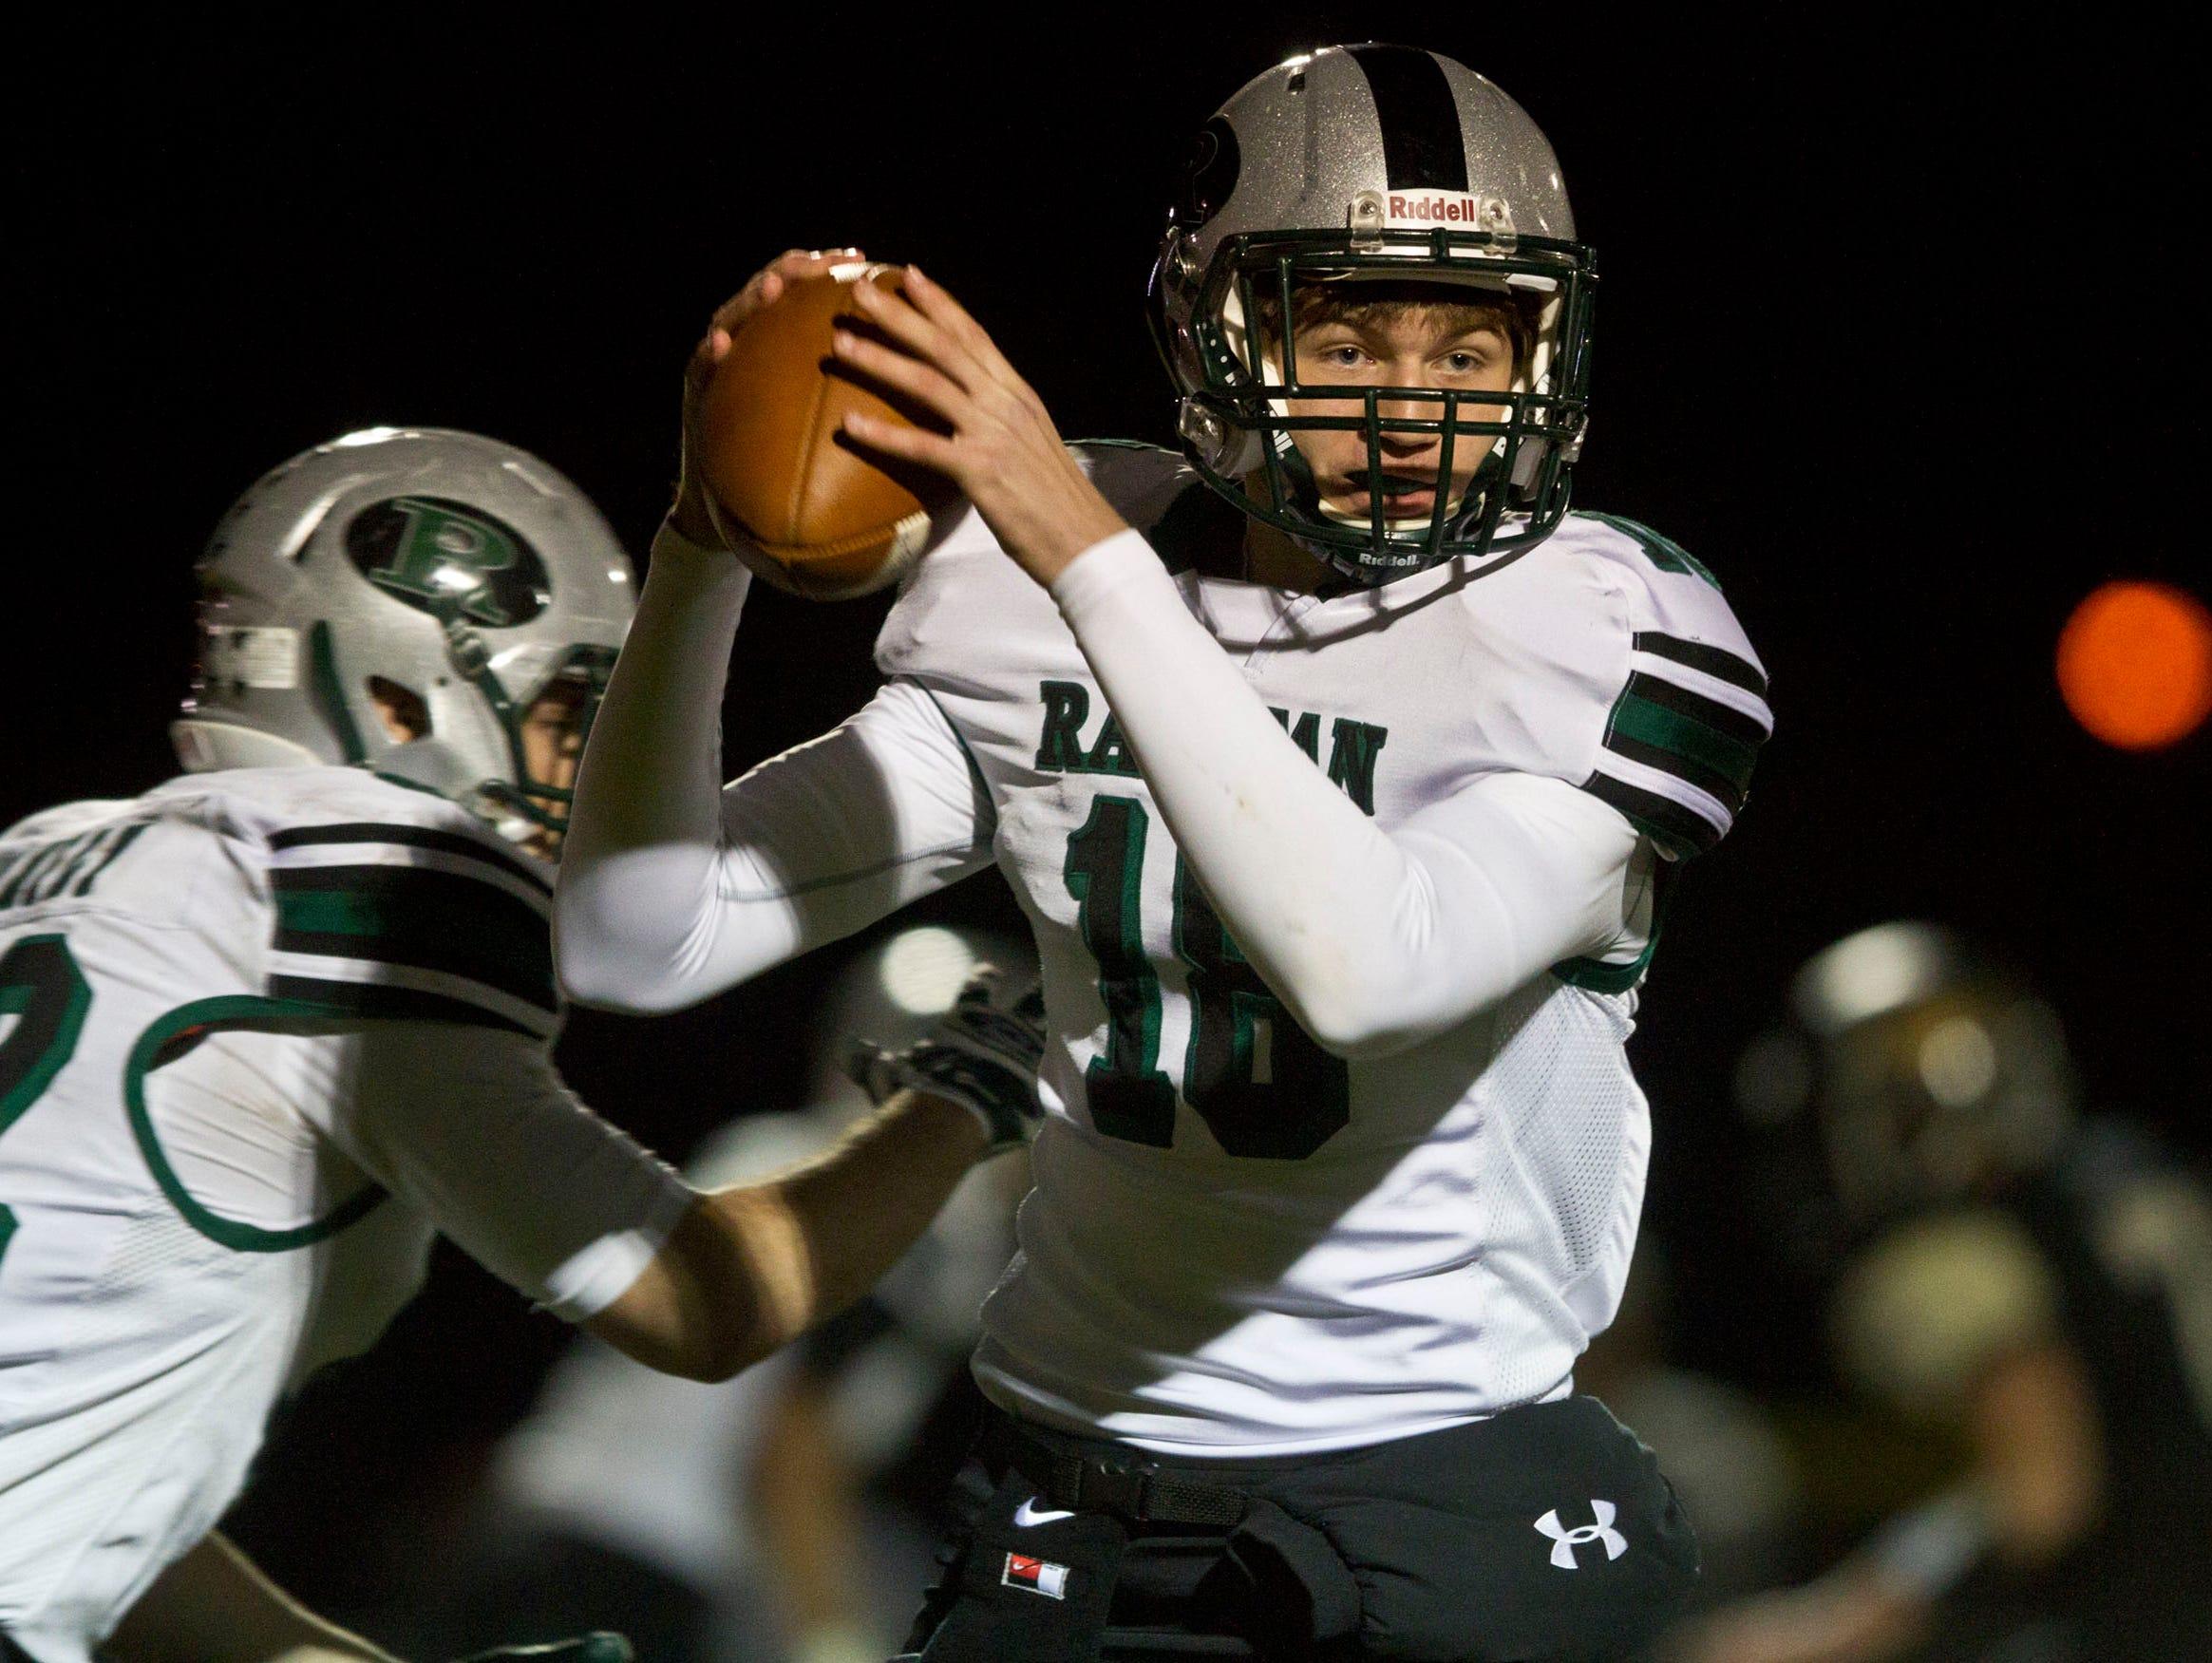 Raritan's quarterback Marc Carnivale. Raritan vs Point Pleasant Boro NJSIAA Group II playoff game. Point Pleasant, NJ Friday, November 13, 2015 @dhoodhood